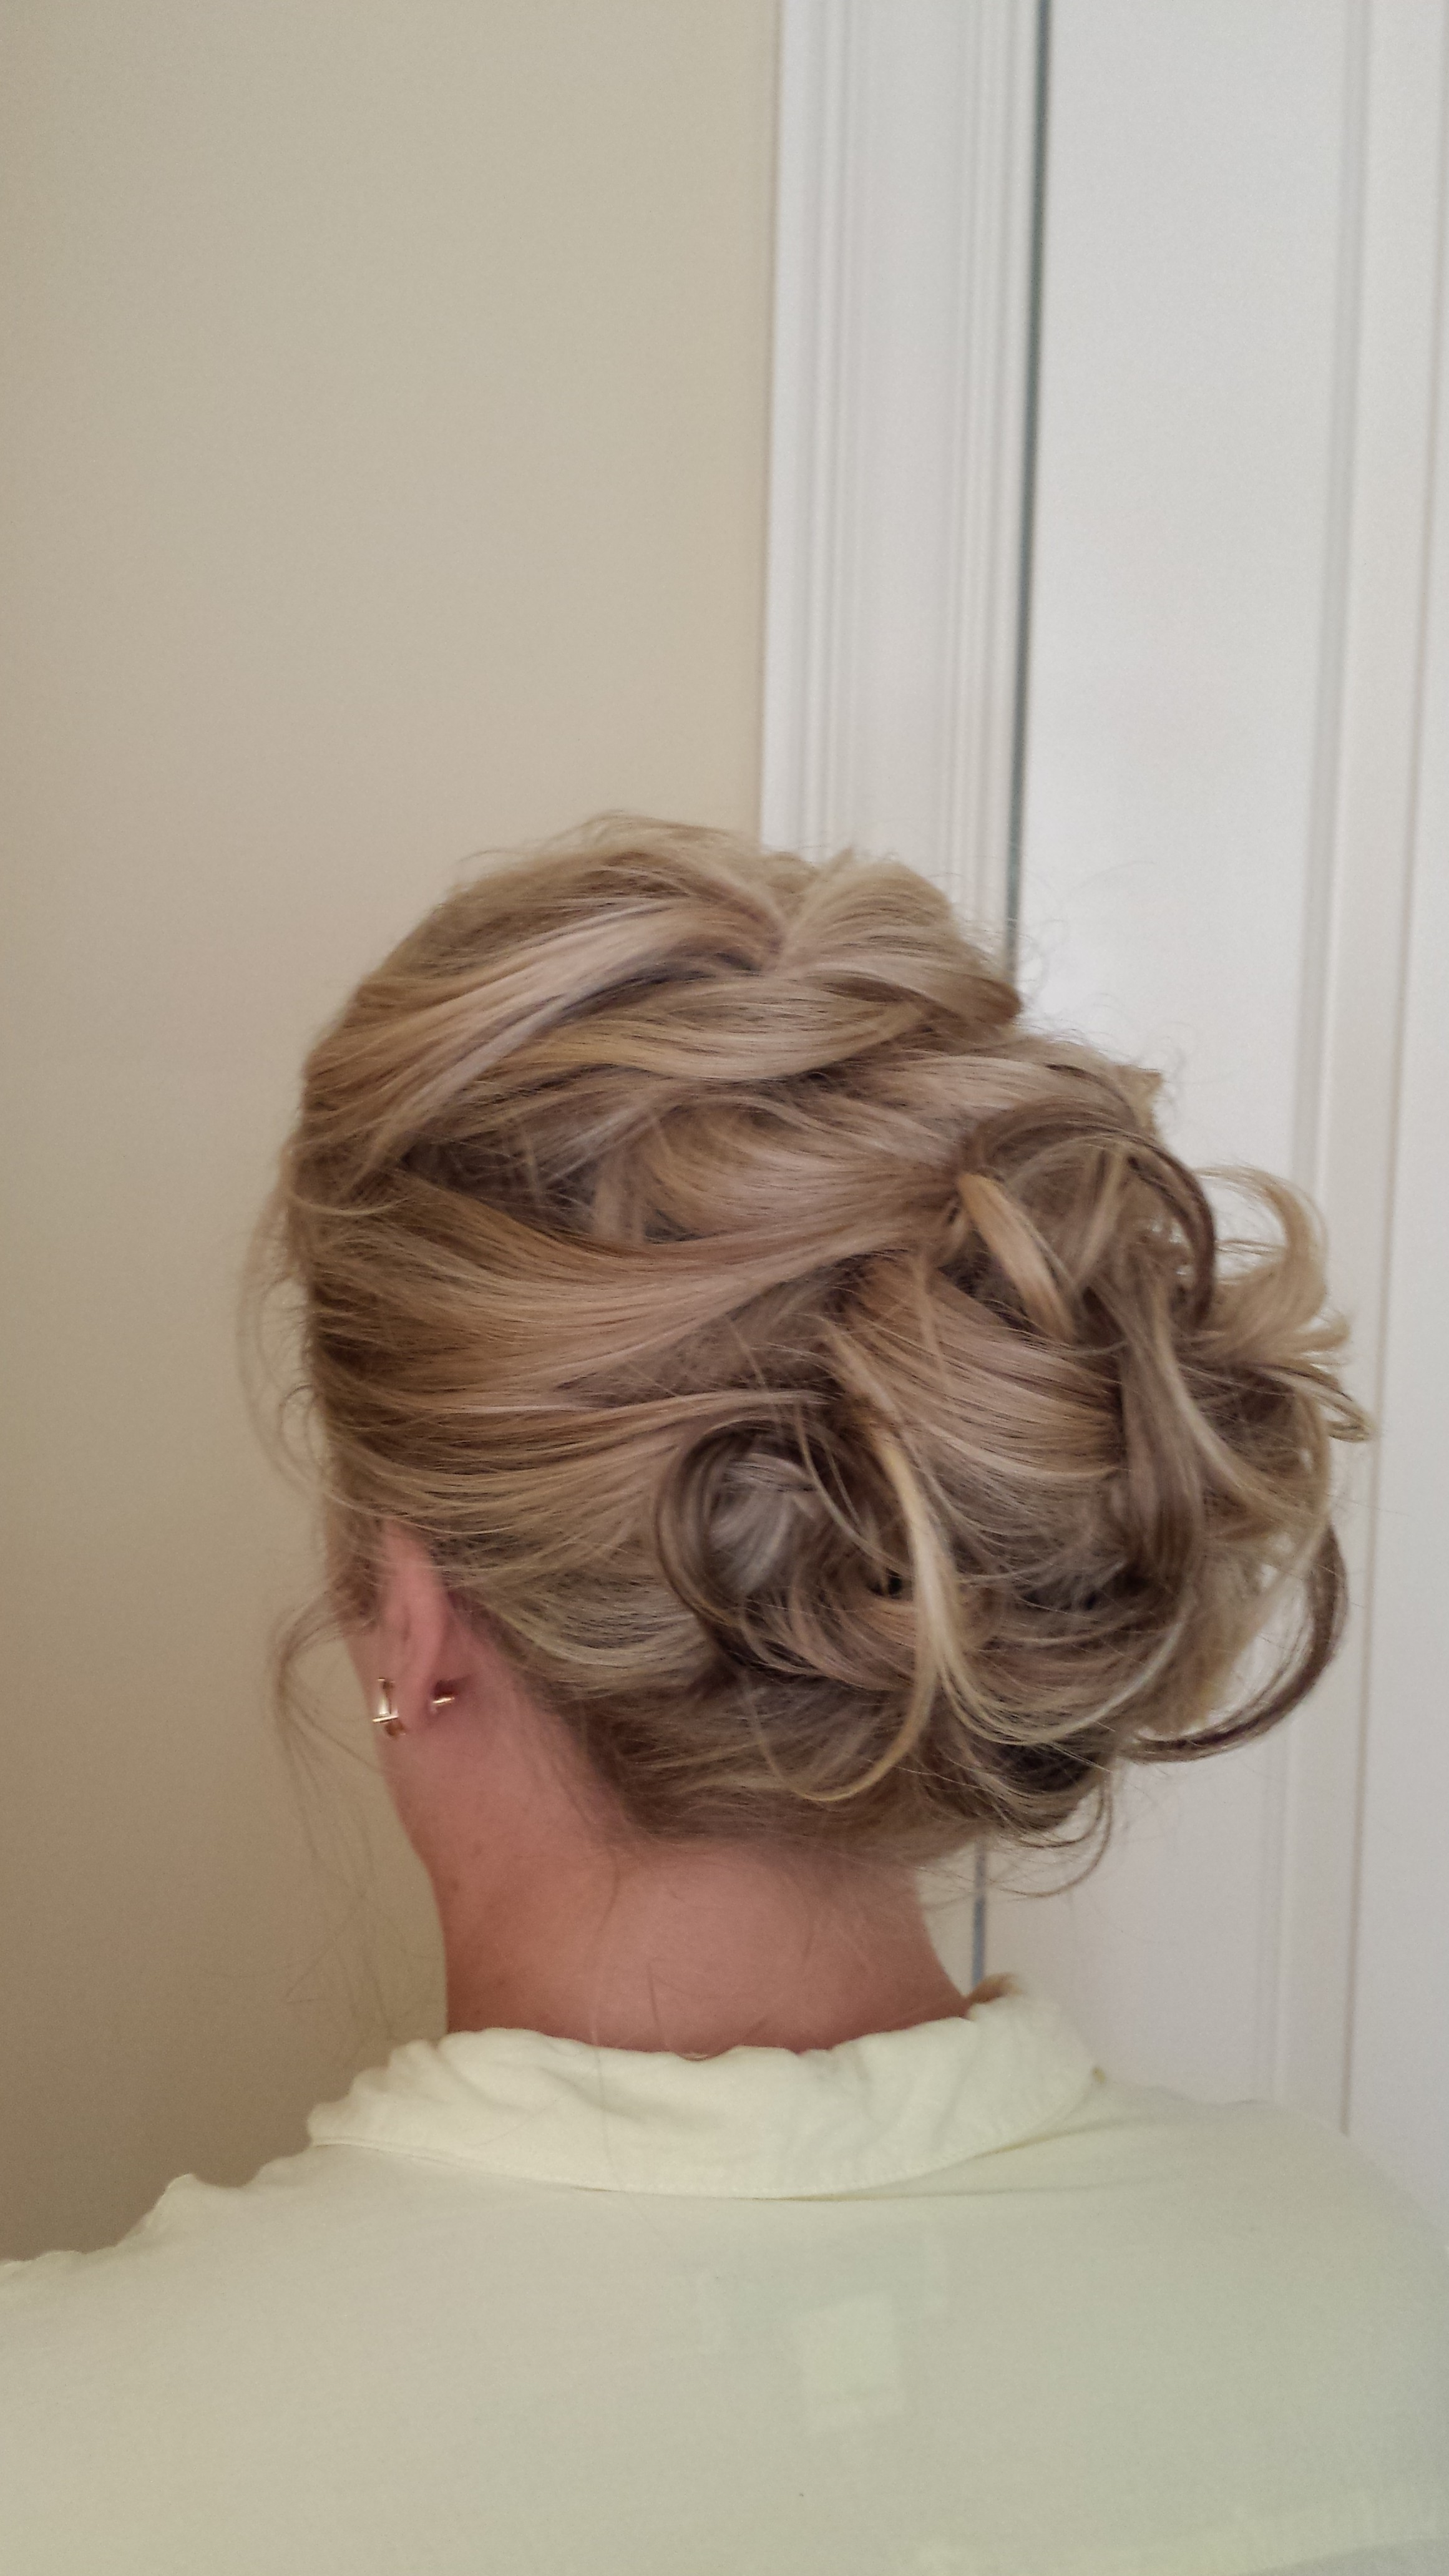 Loose bridal updo by Beyond Beautiful by Heather, Savannah, GA